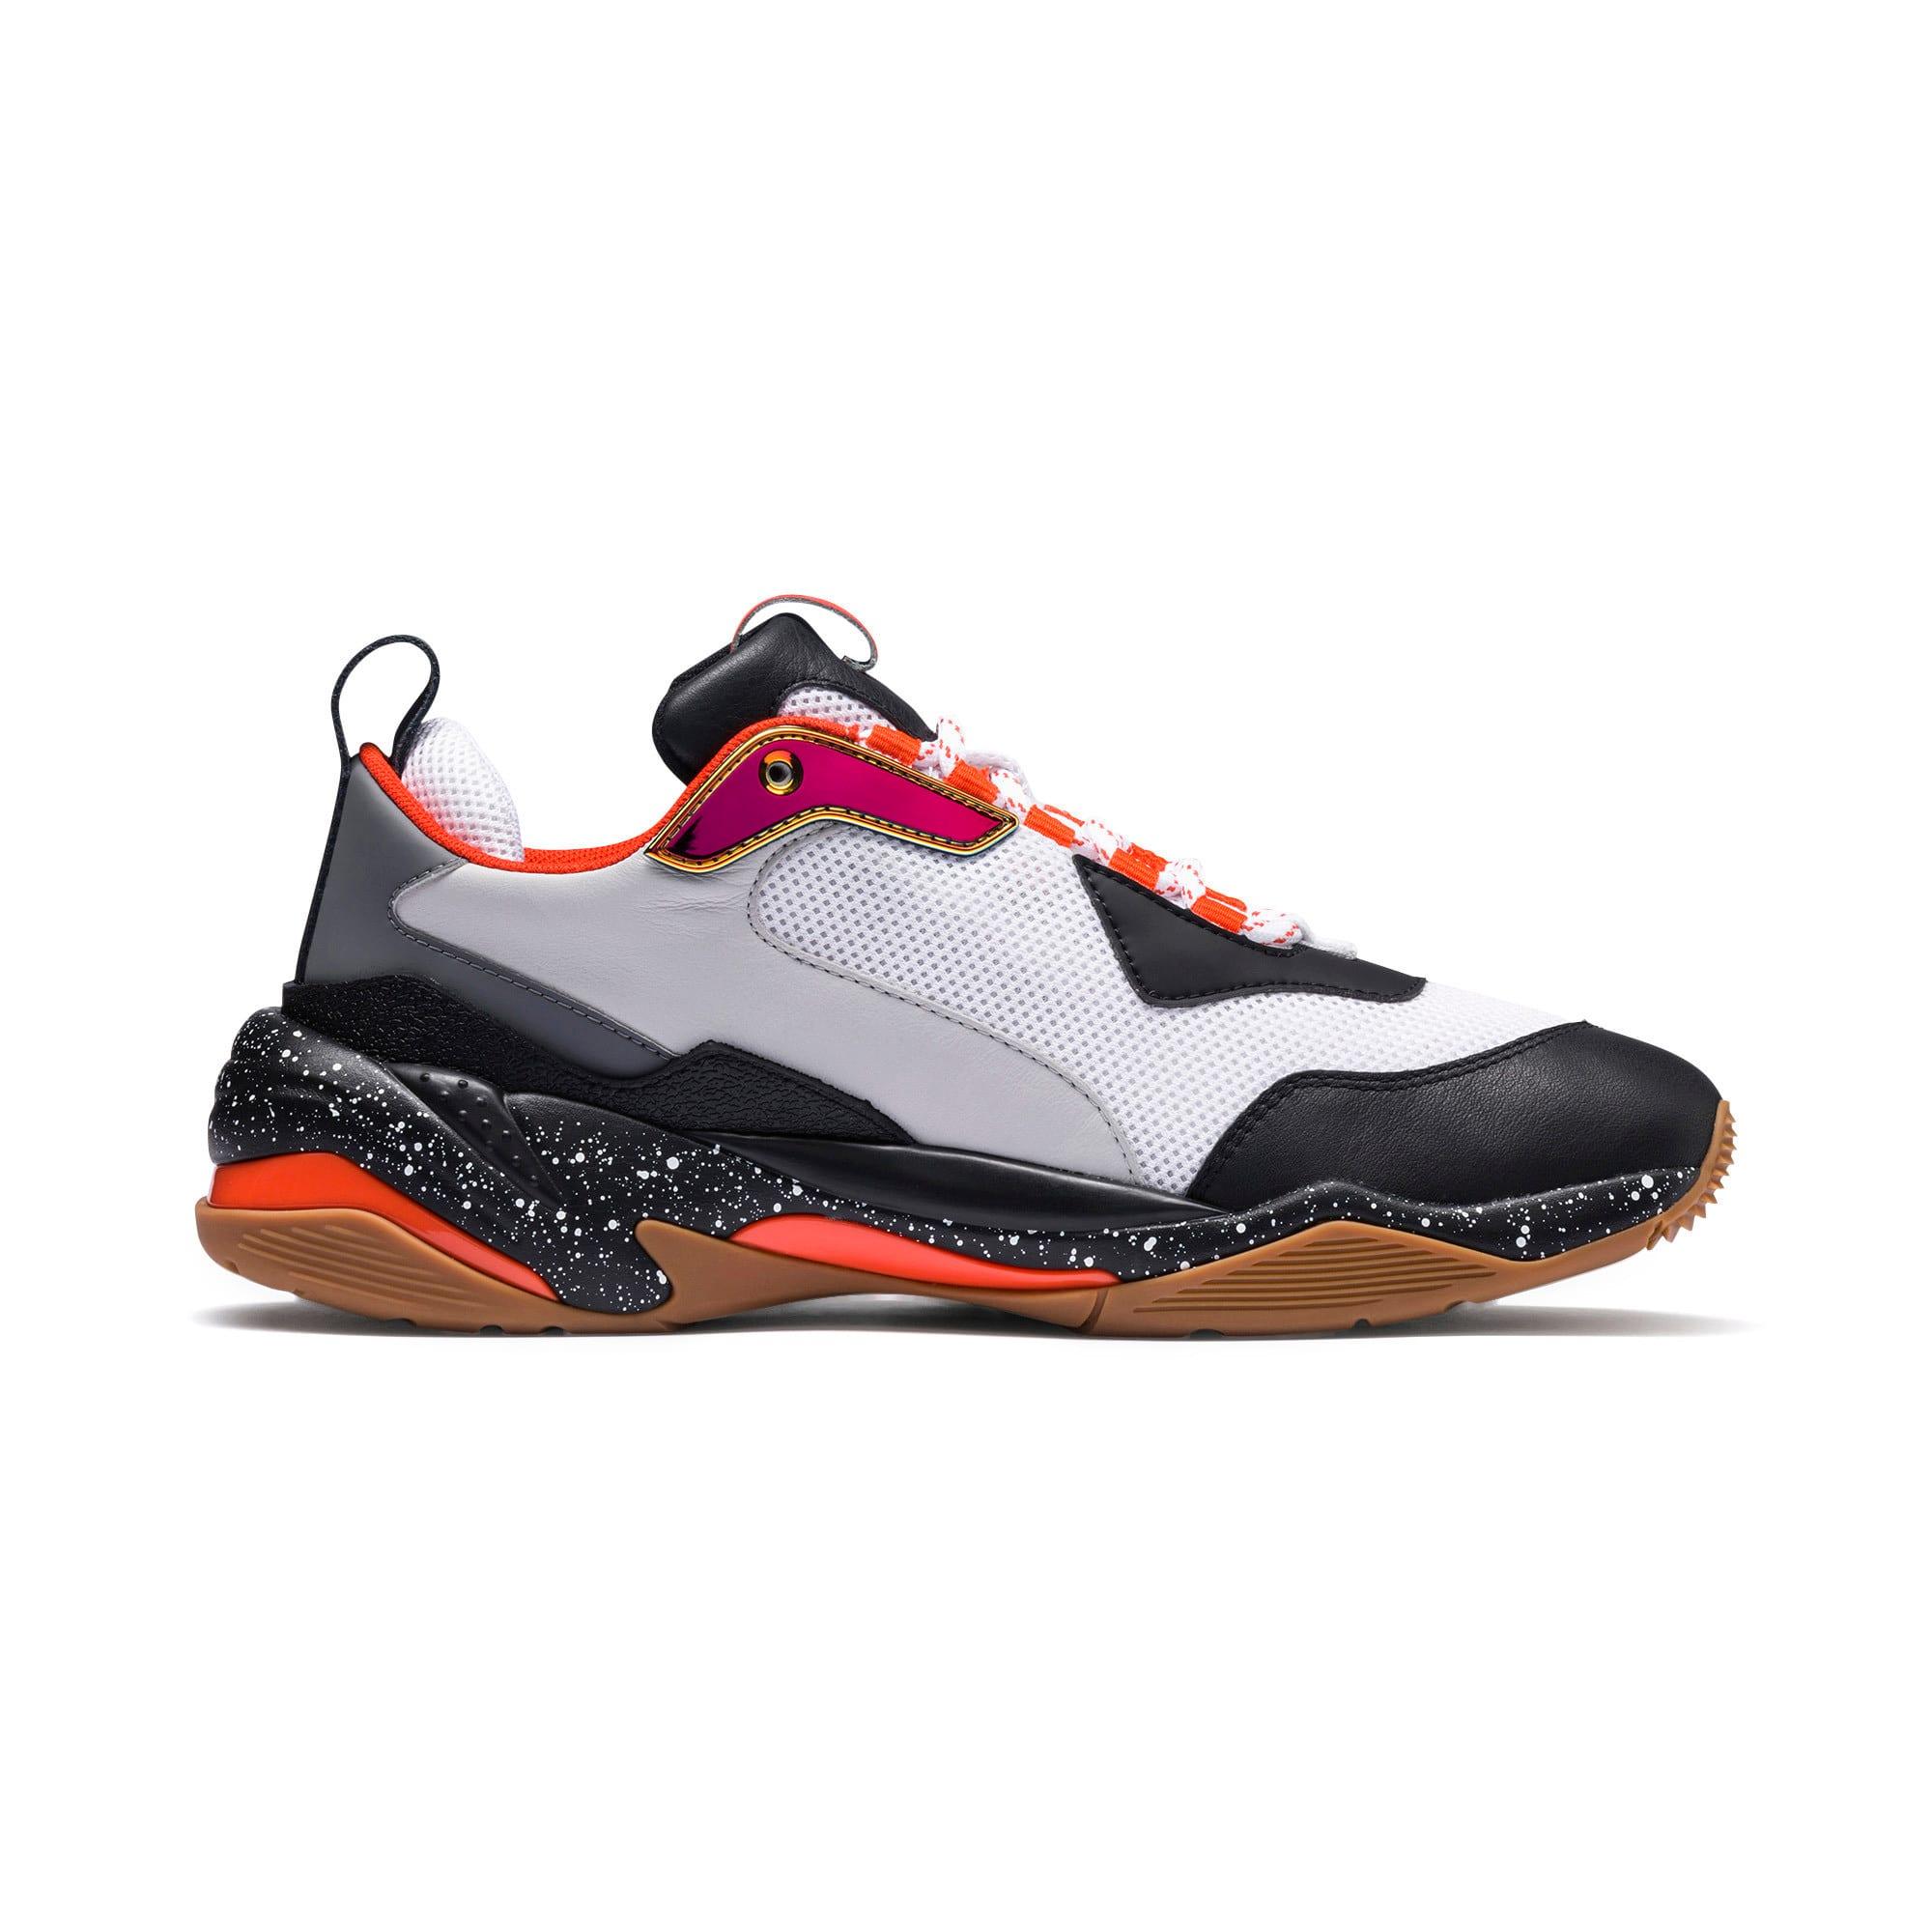 Thumbnail 5 of Thunder Electric Sneakers, White-Black-Mandarine Red, medium